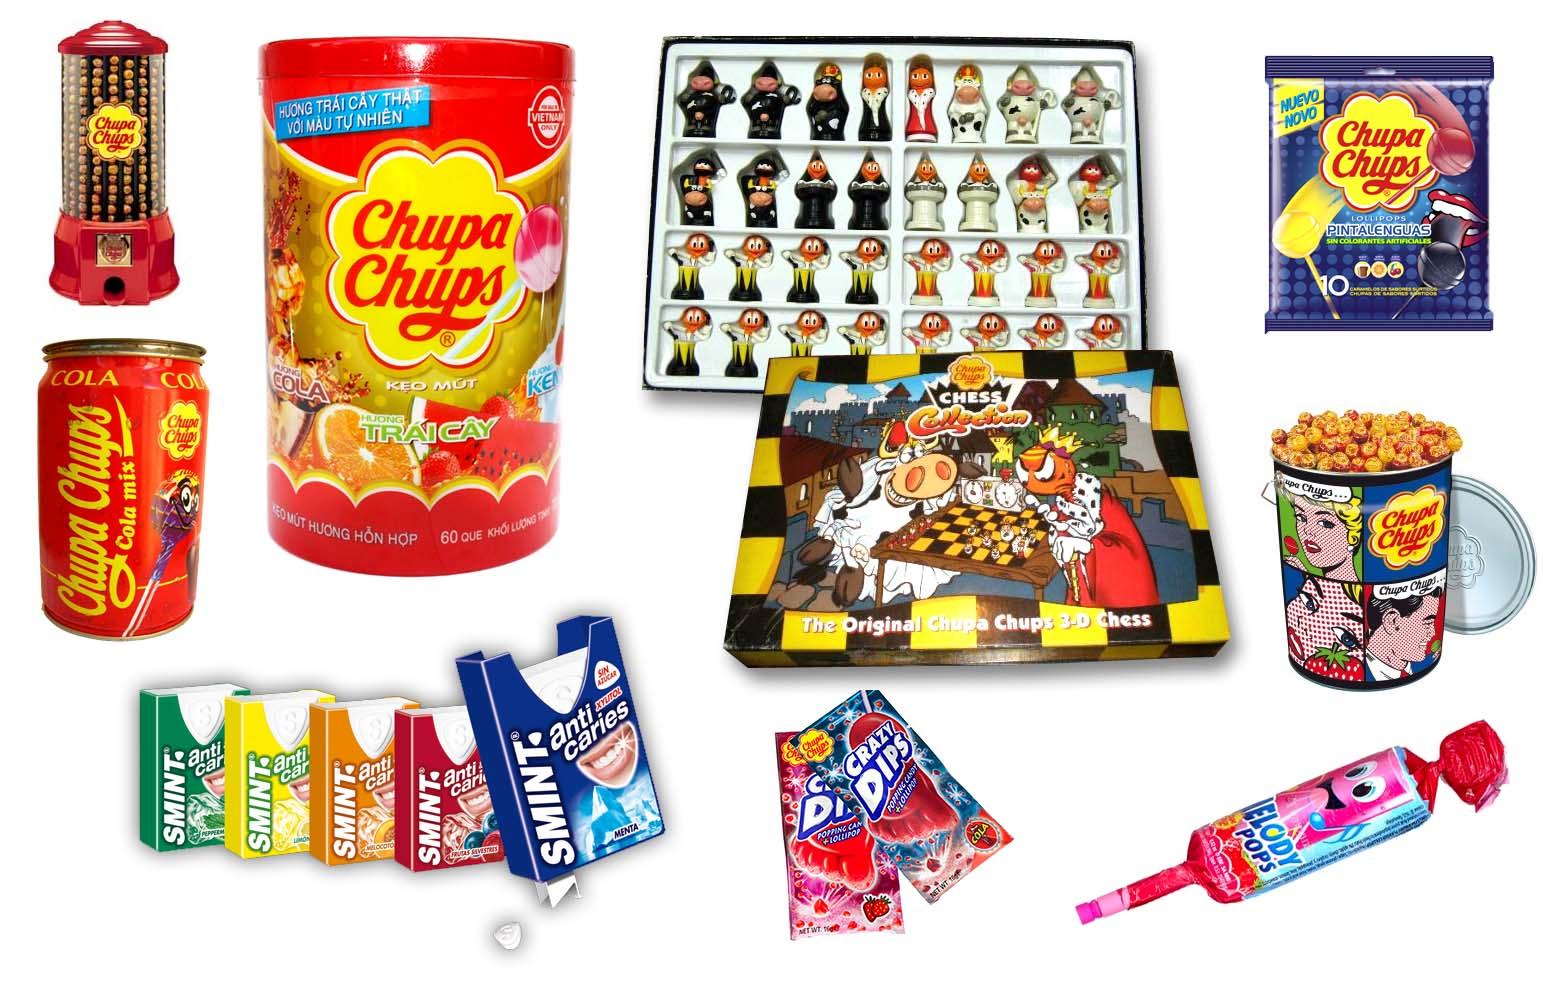 Empresas chupa chups the story of lollipops in english el apasionante mundo de la empresa - Housse de couette chupa chups ...